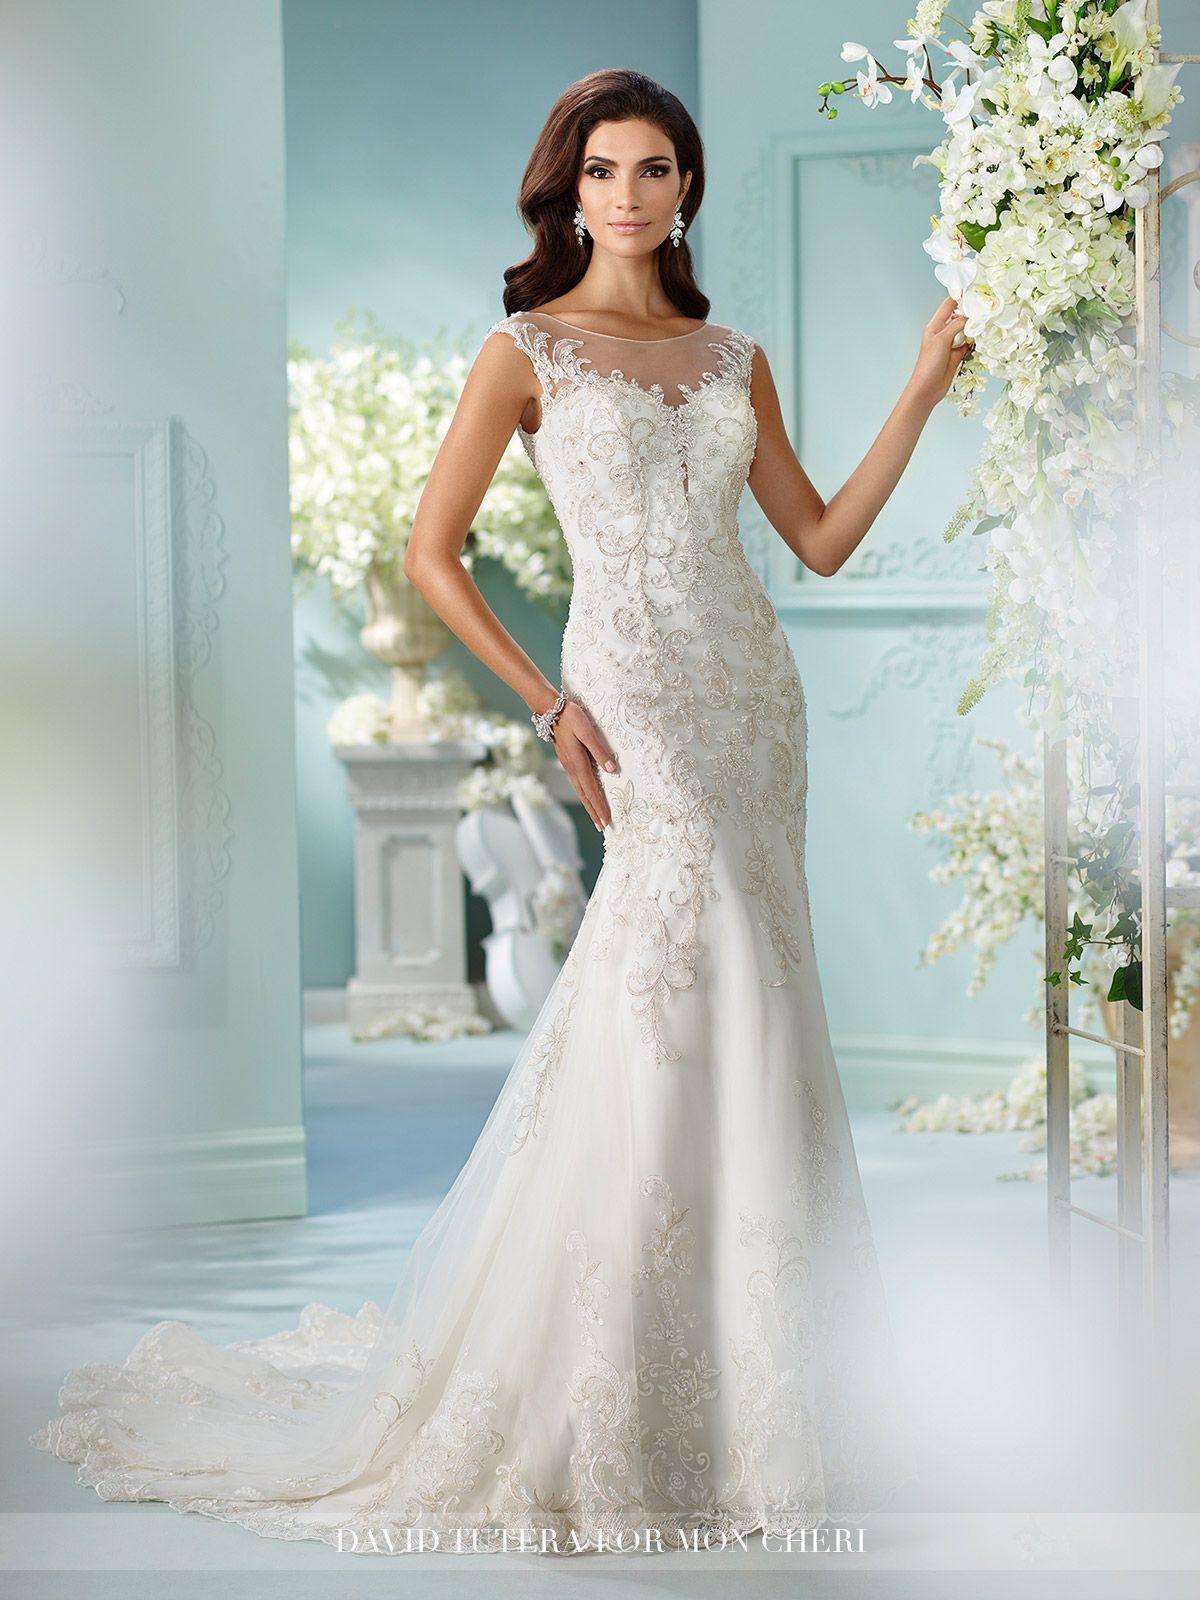 Funky Amazing Wedding Gown Photos - All Wedding Dresses ...